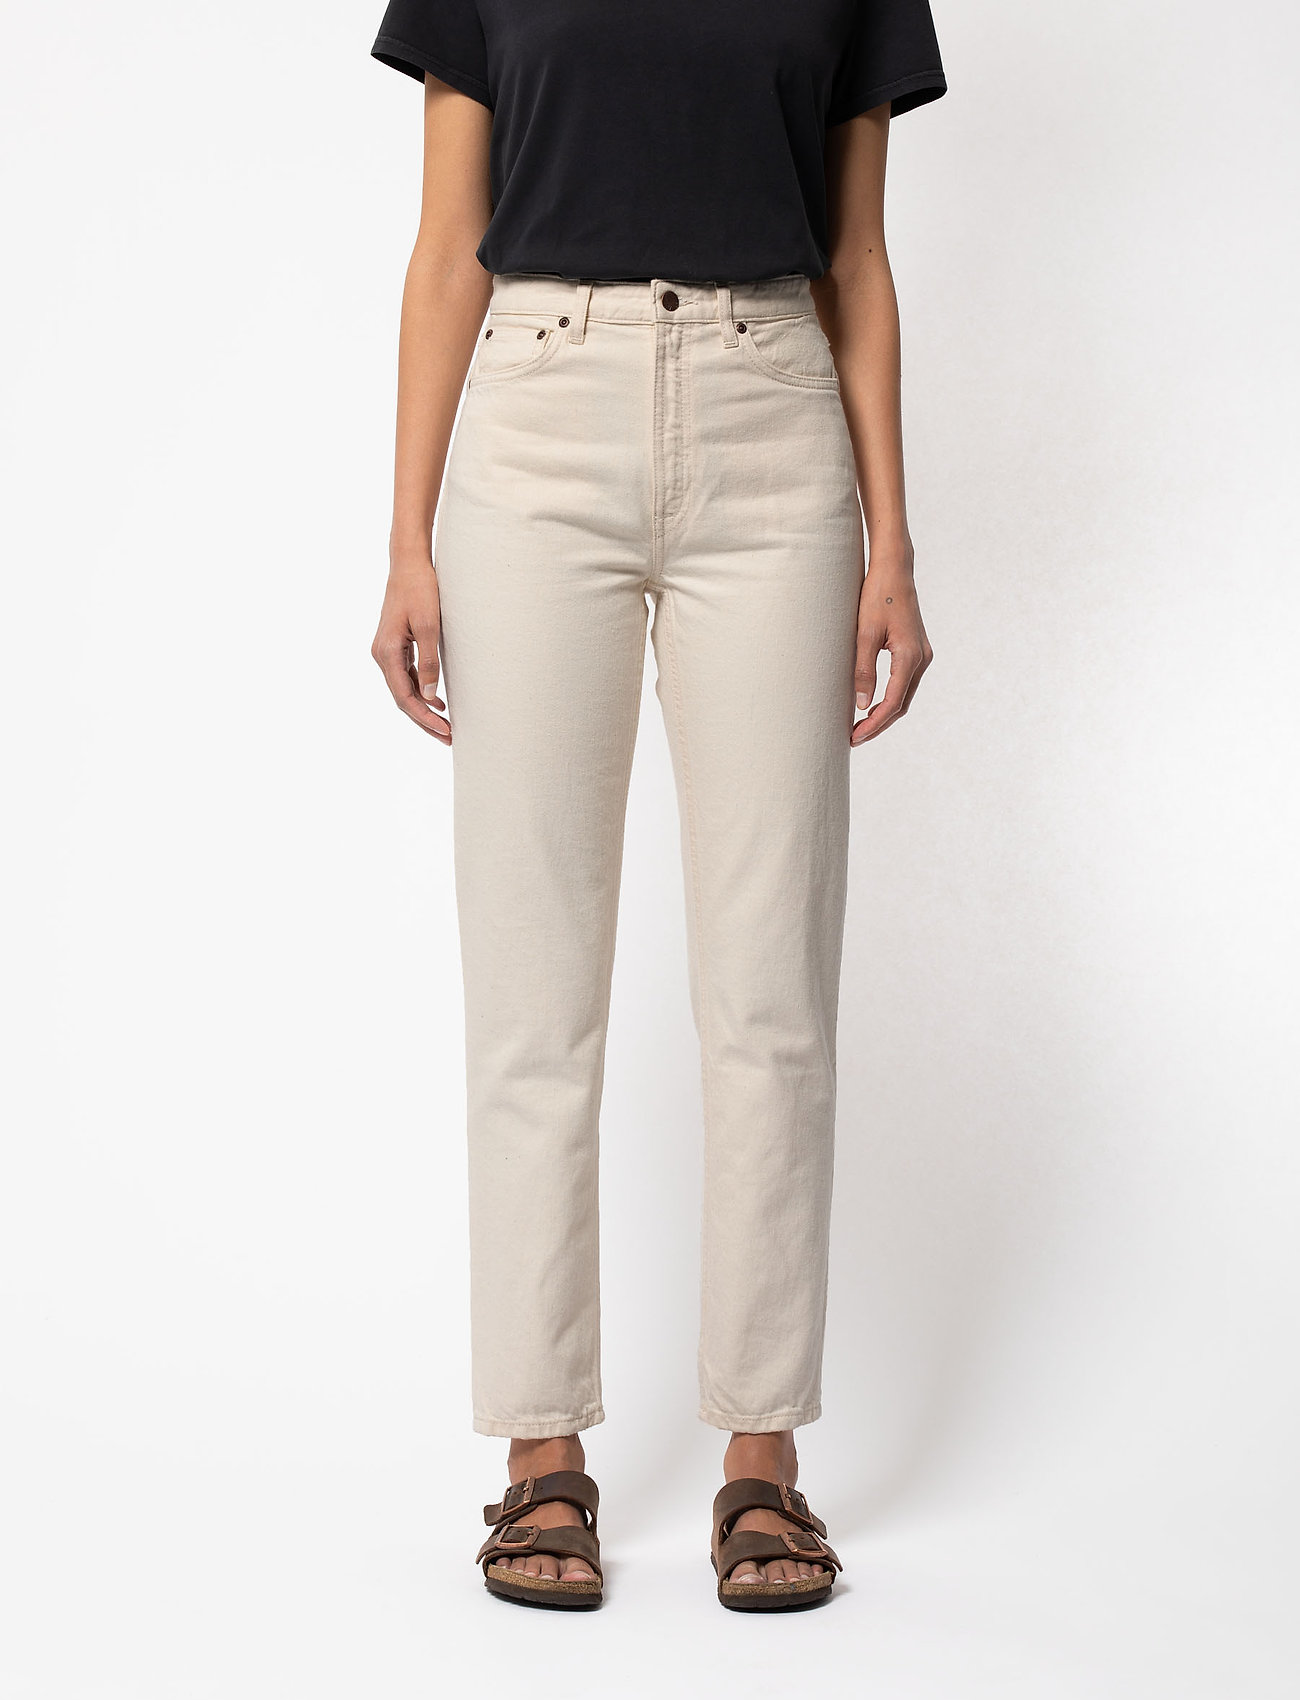 Nudie Jeans - Breezy Britt - straight regular - dusty white - 0